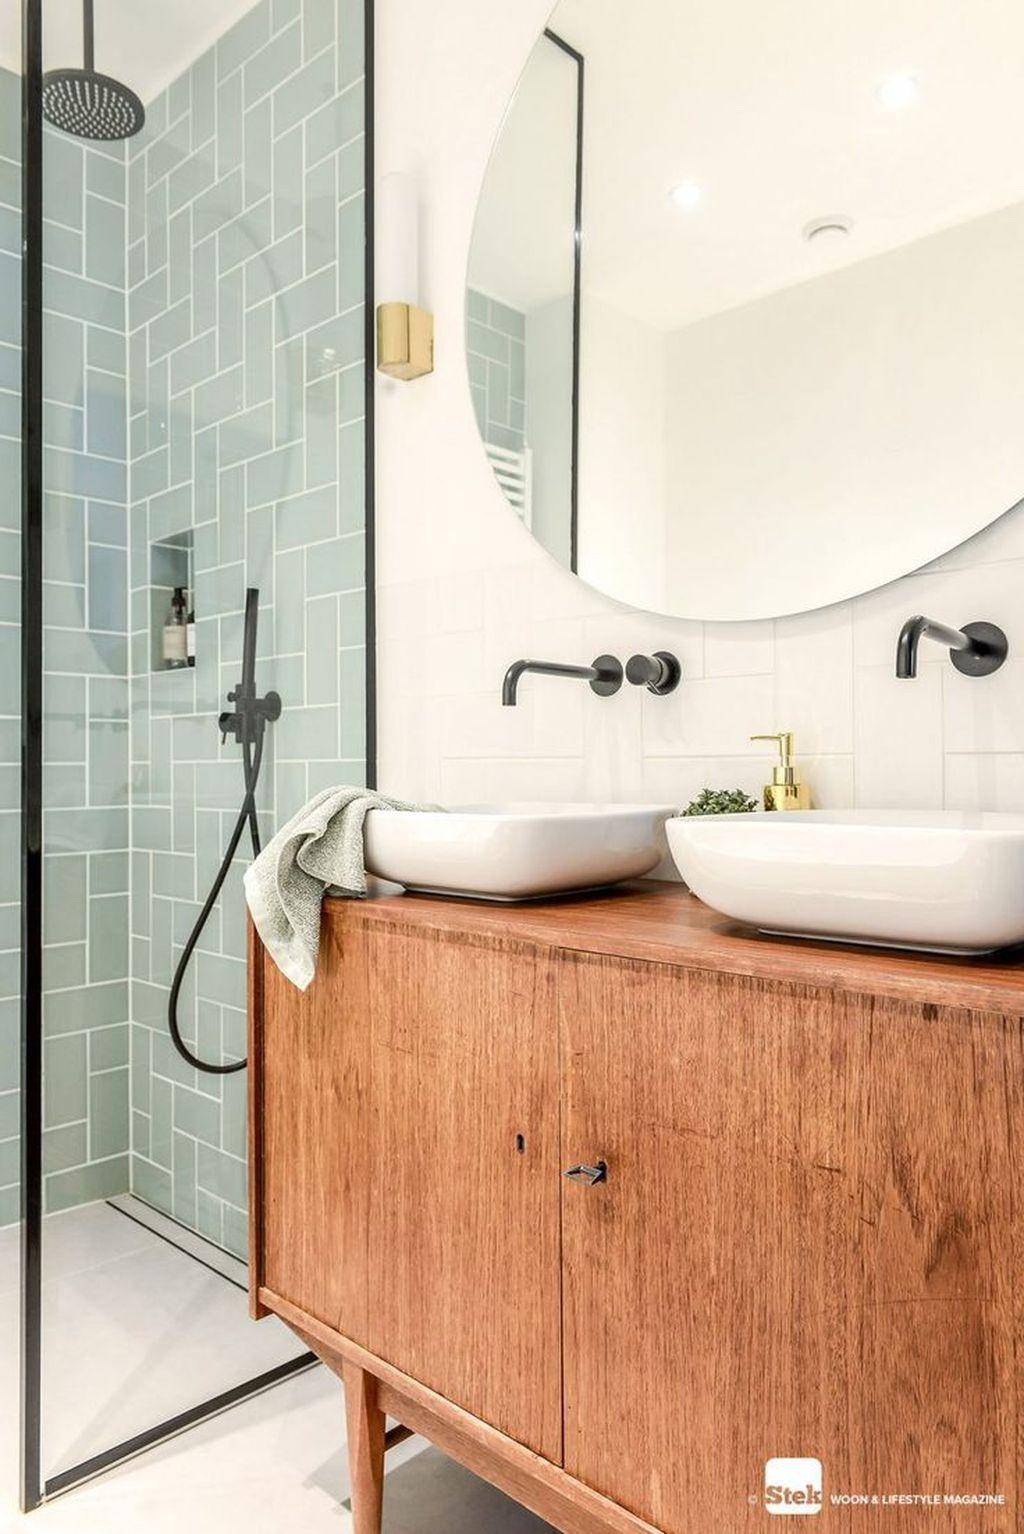 Unusual Bathroom Design Ideas You Need To Know 18